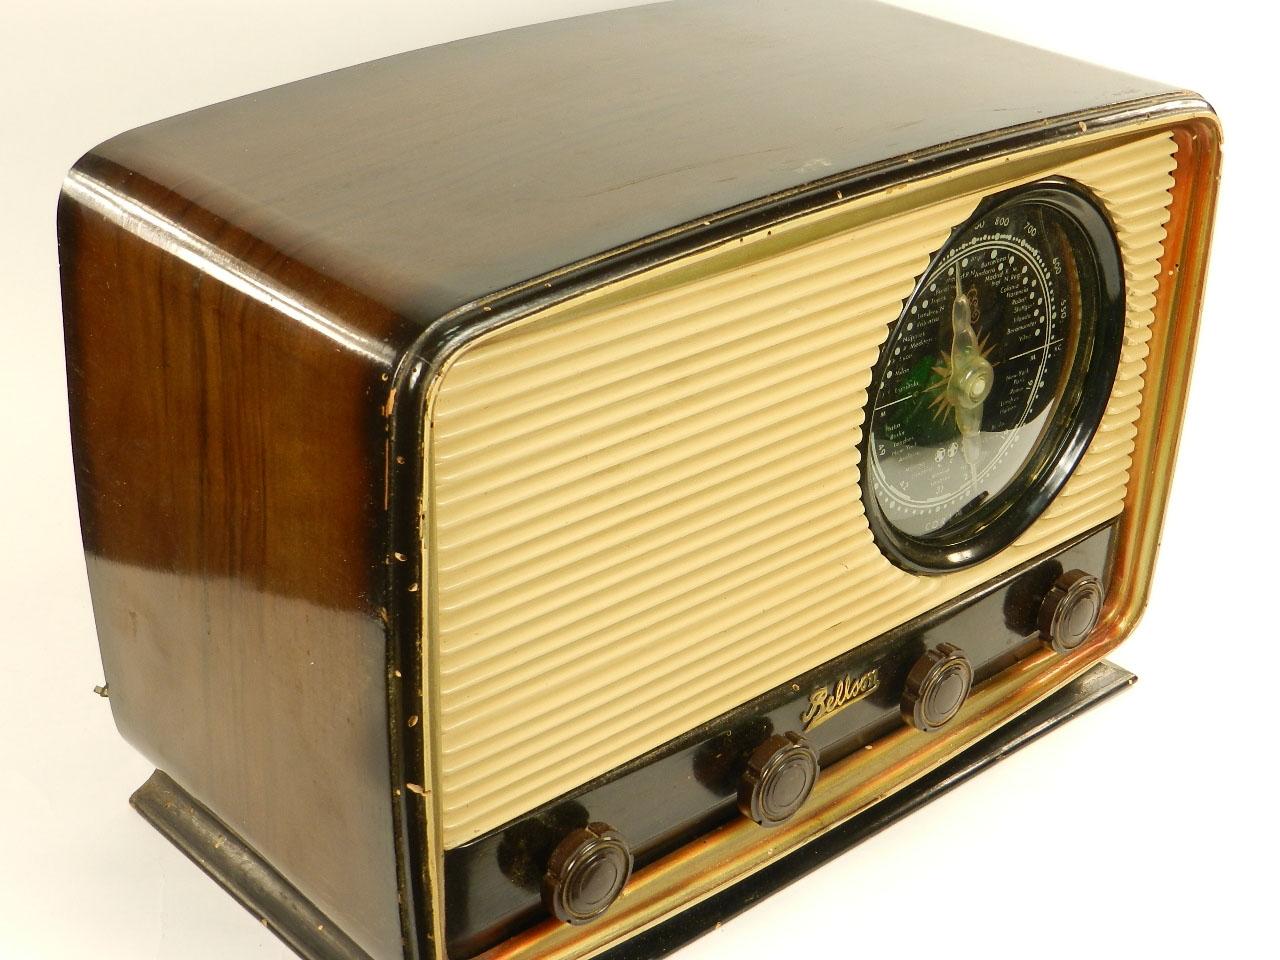 Imagen RADIO ANTIGUA BELLSON AÑO 1950 25859